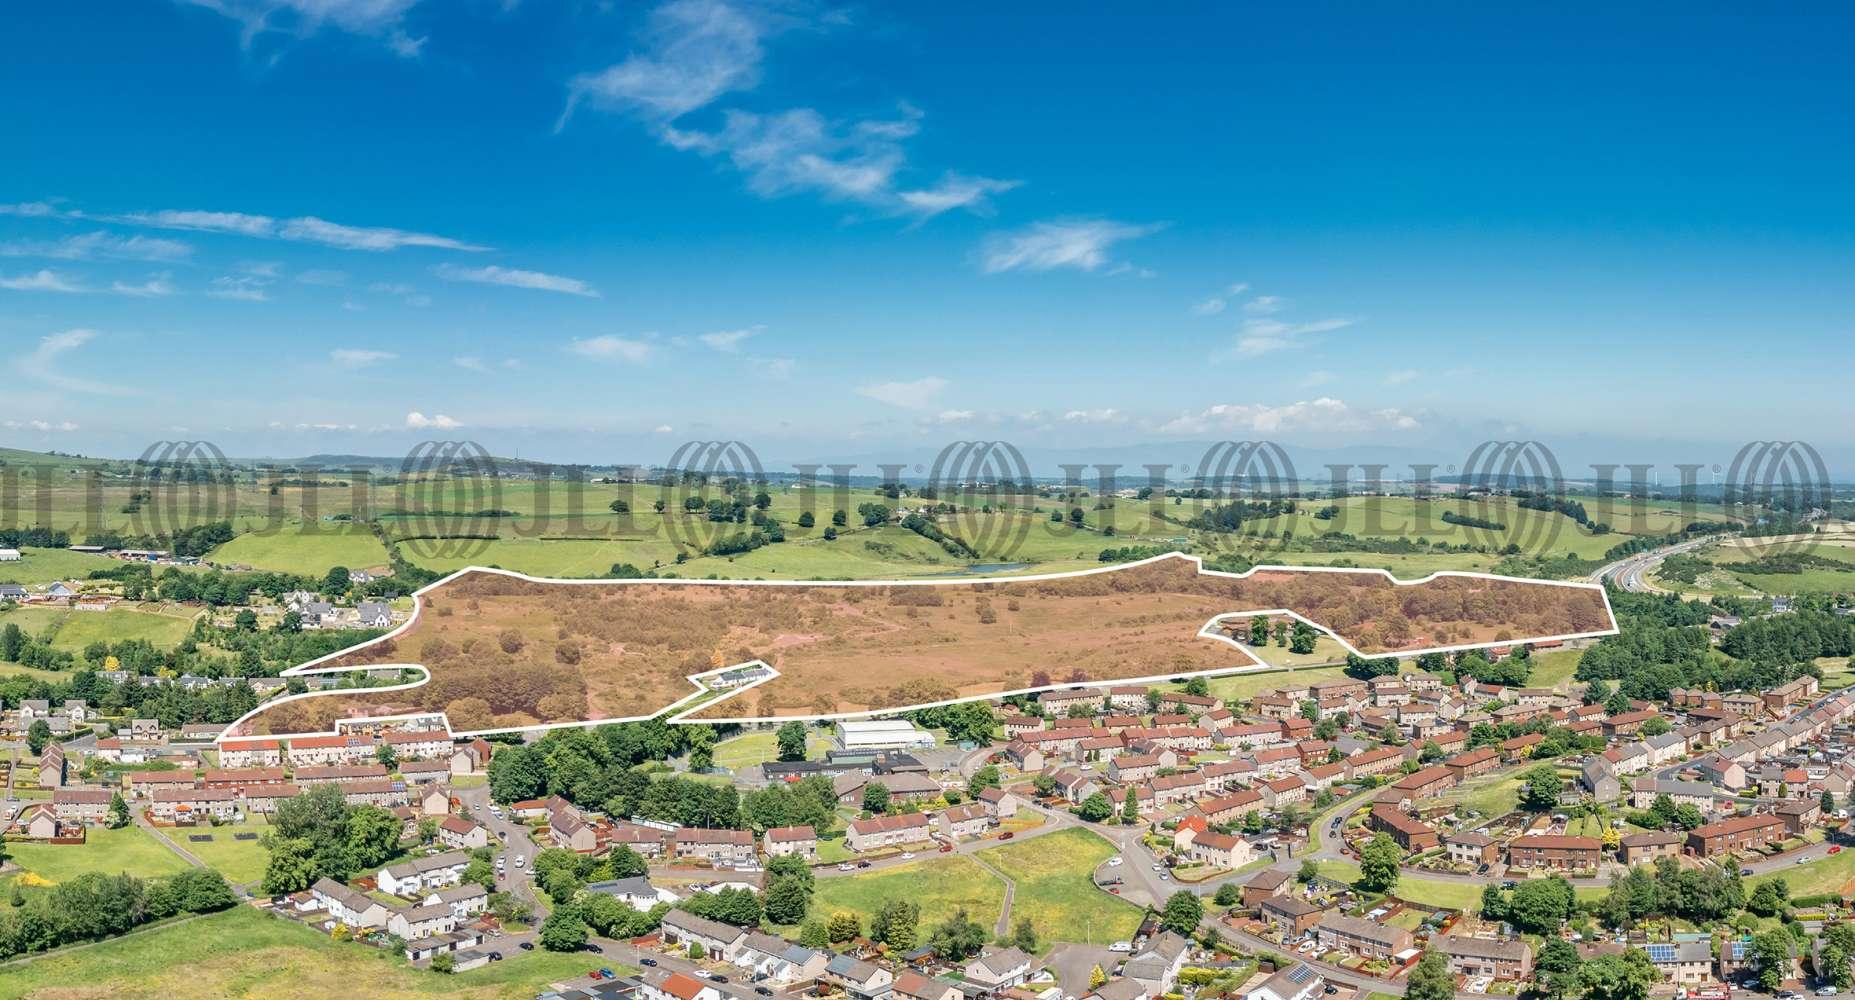 Land Bonnybridge, banknock, FK4 1TD - Banknock North, Falkirk